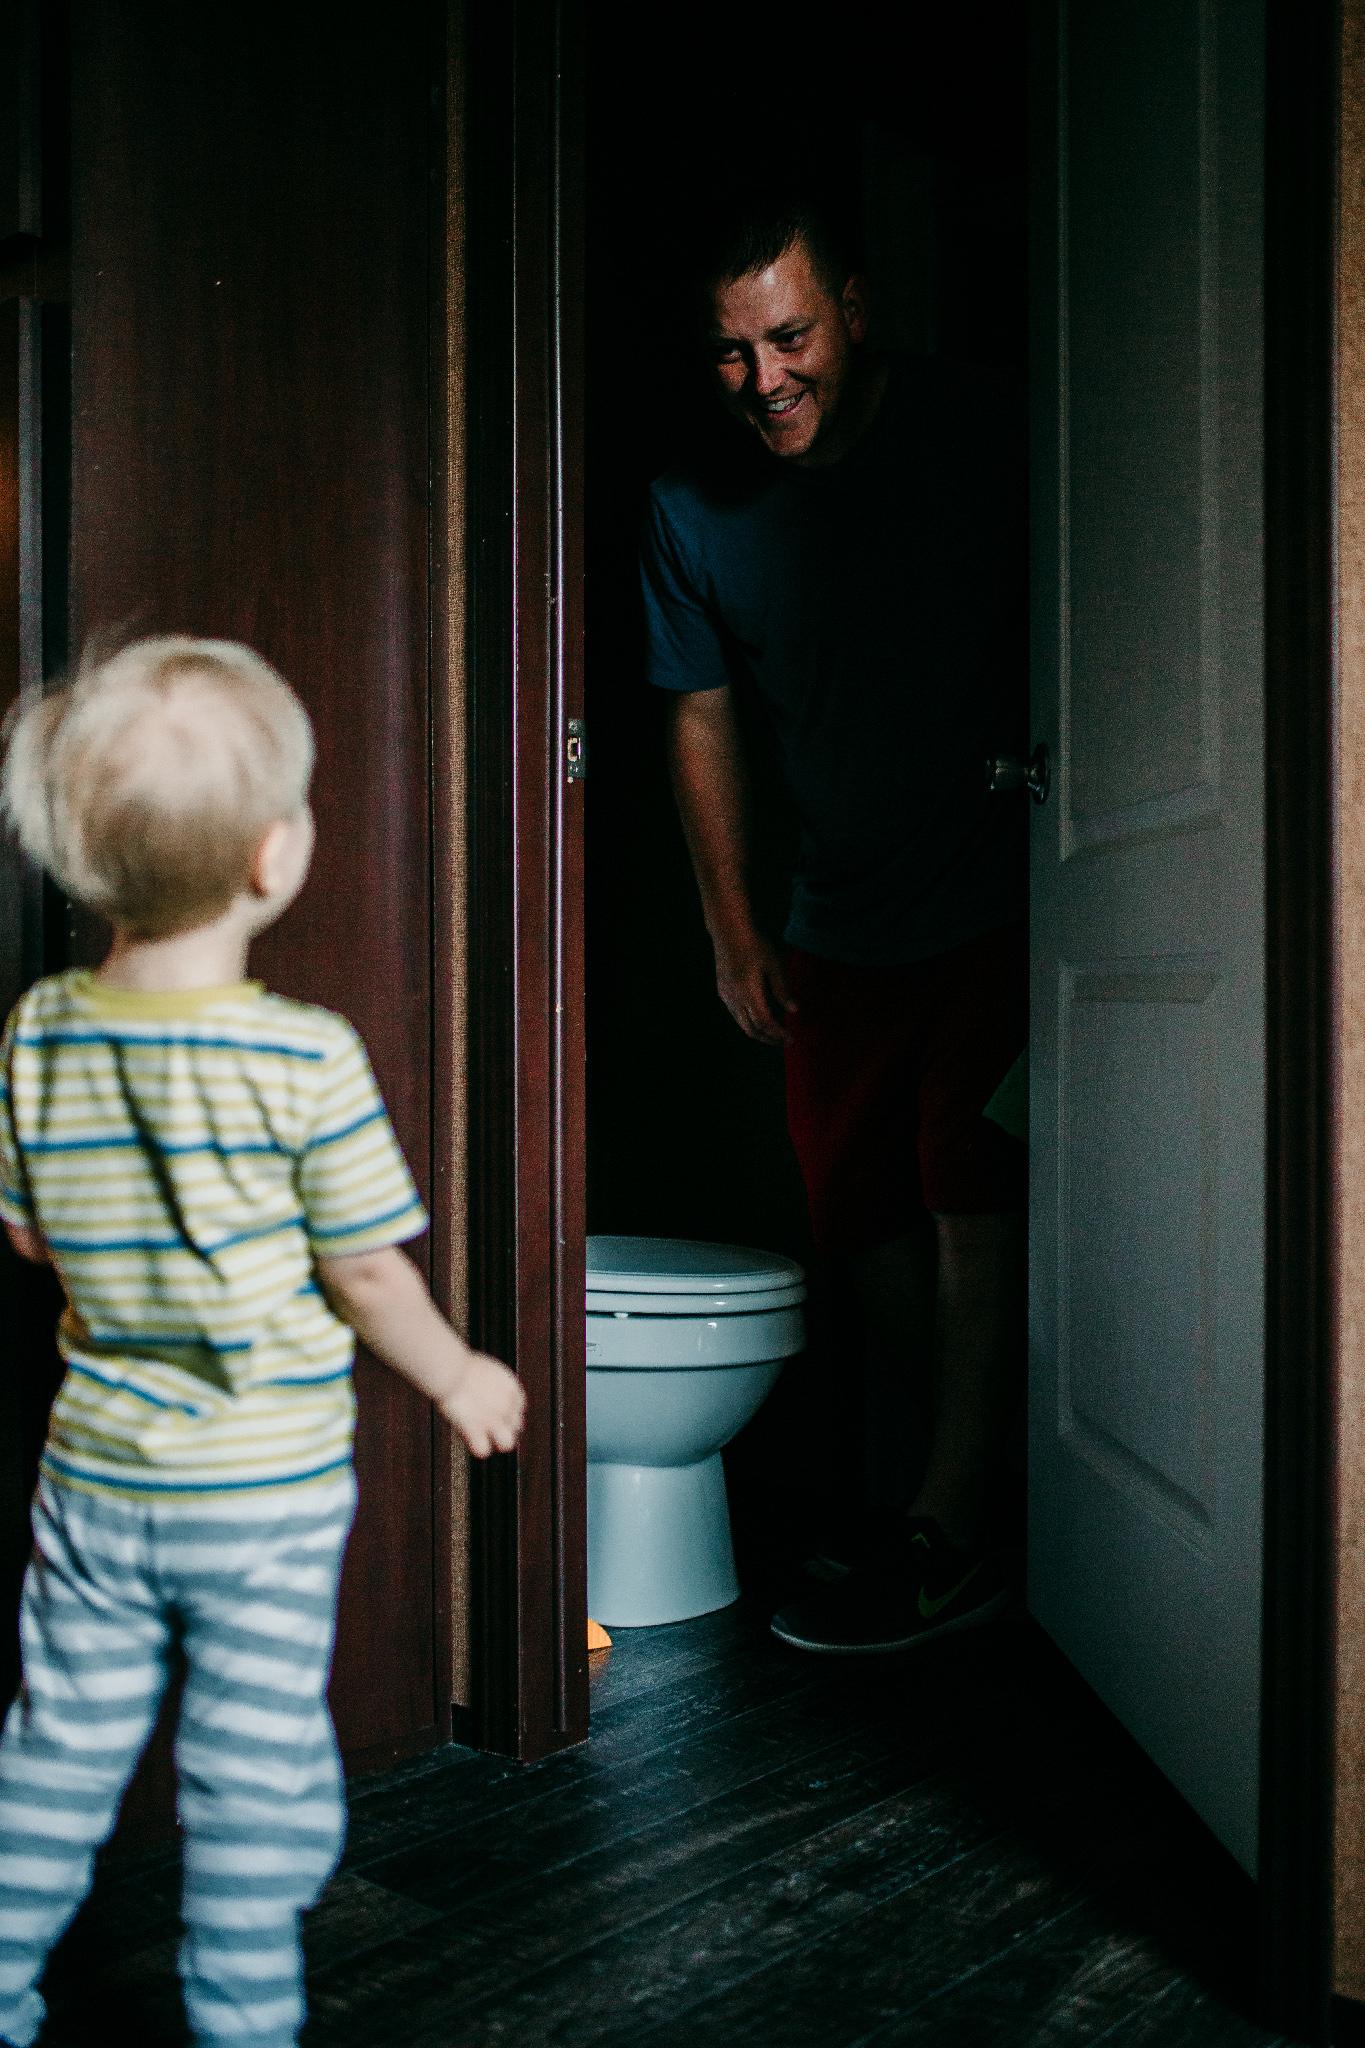 Good Dads play peek-a-boo